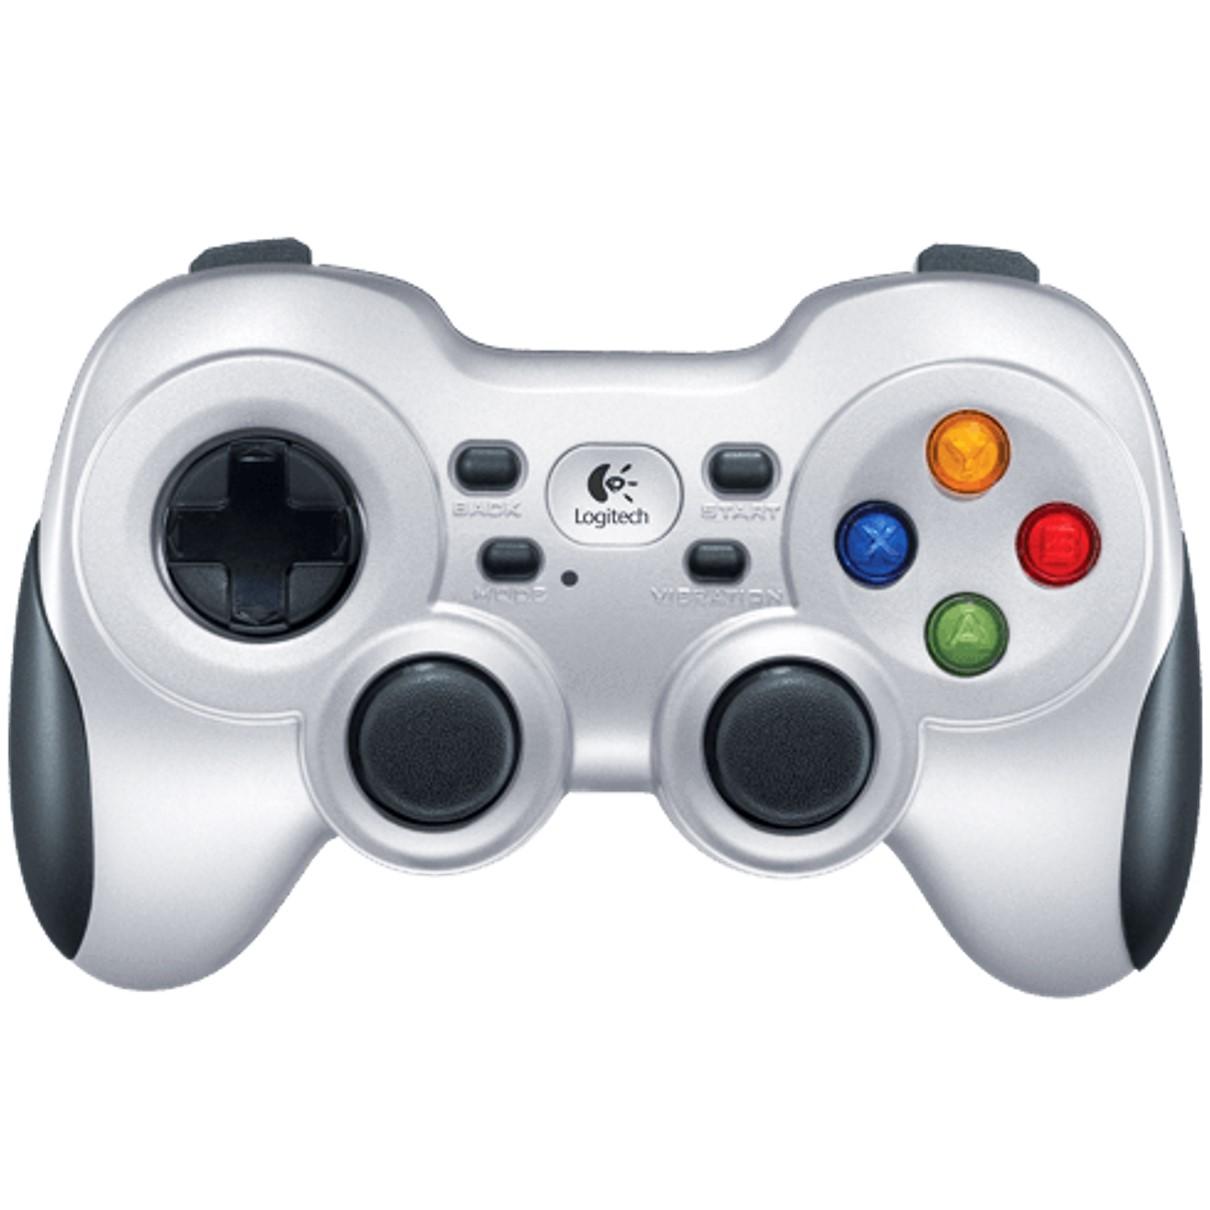 Logitech Wireless Gamepad F710 - mando de videojuegos - inalámbrico - 2.4 GHz